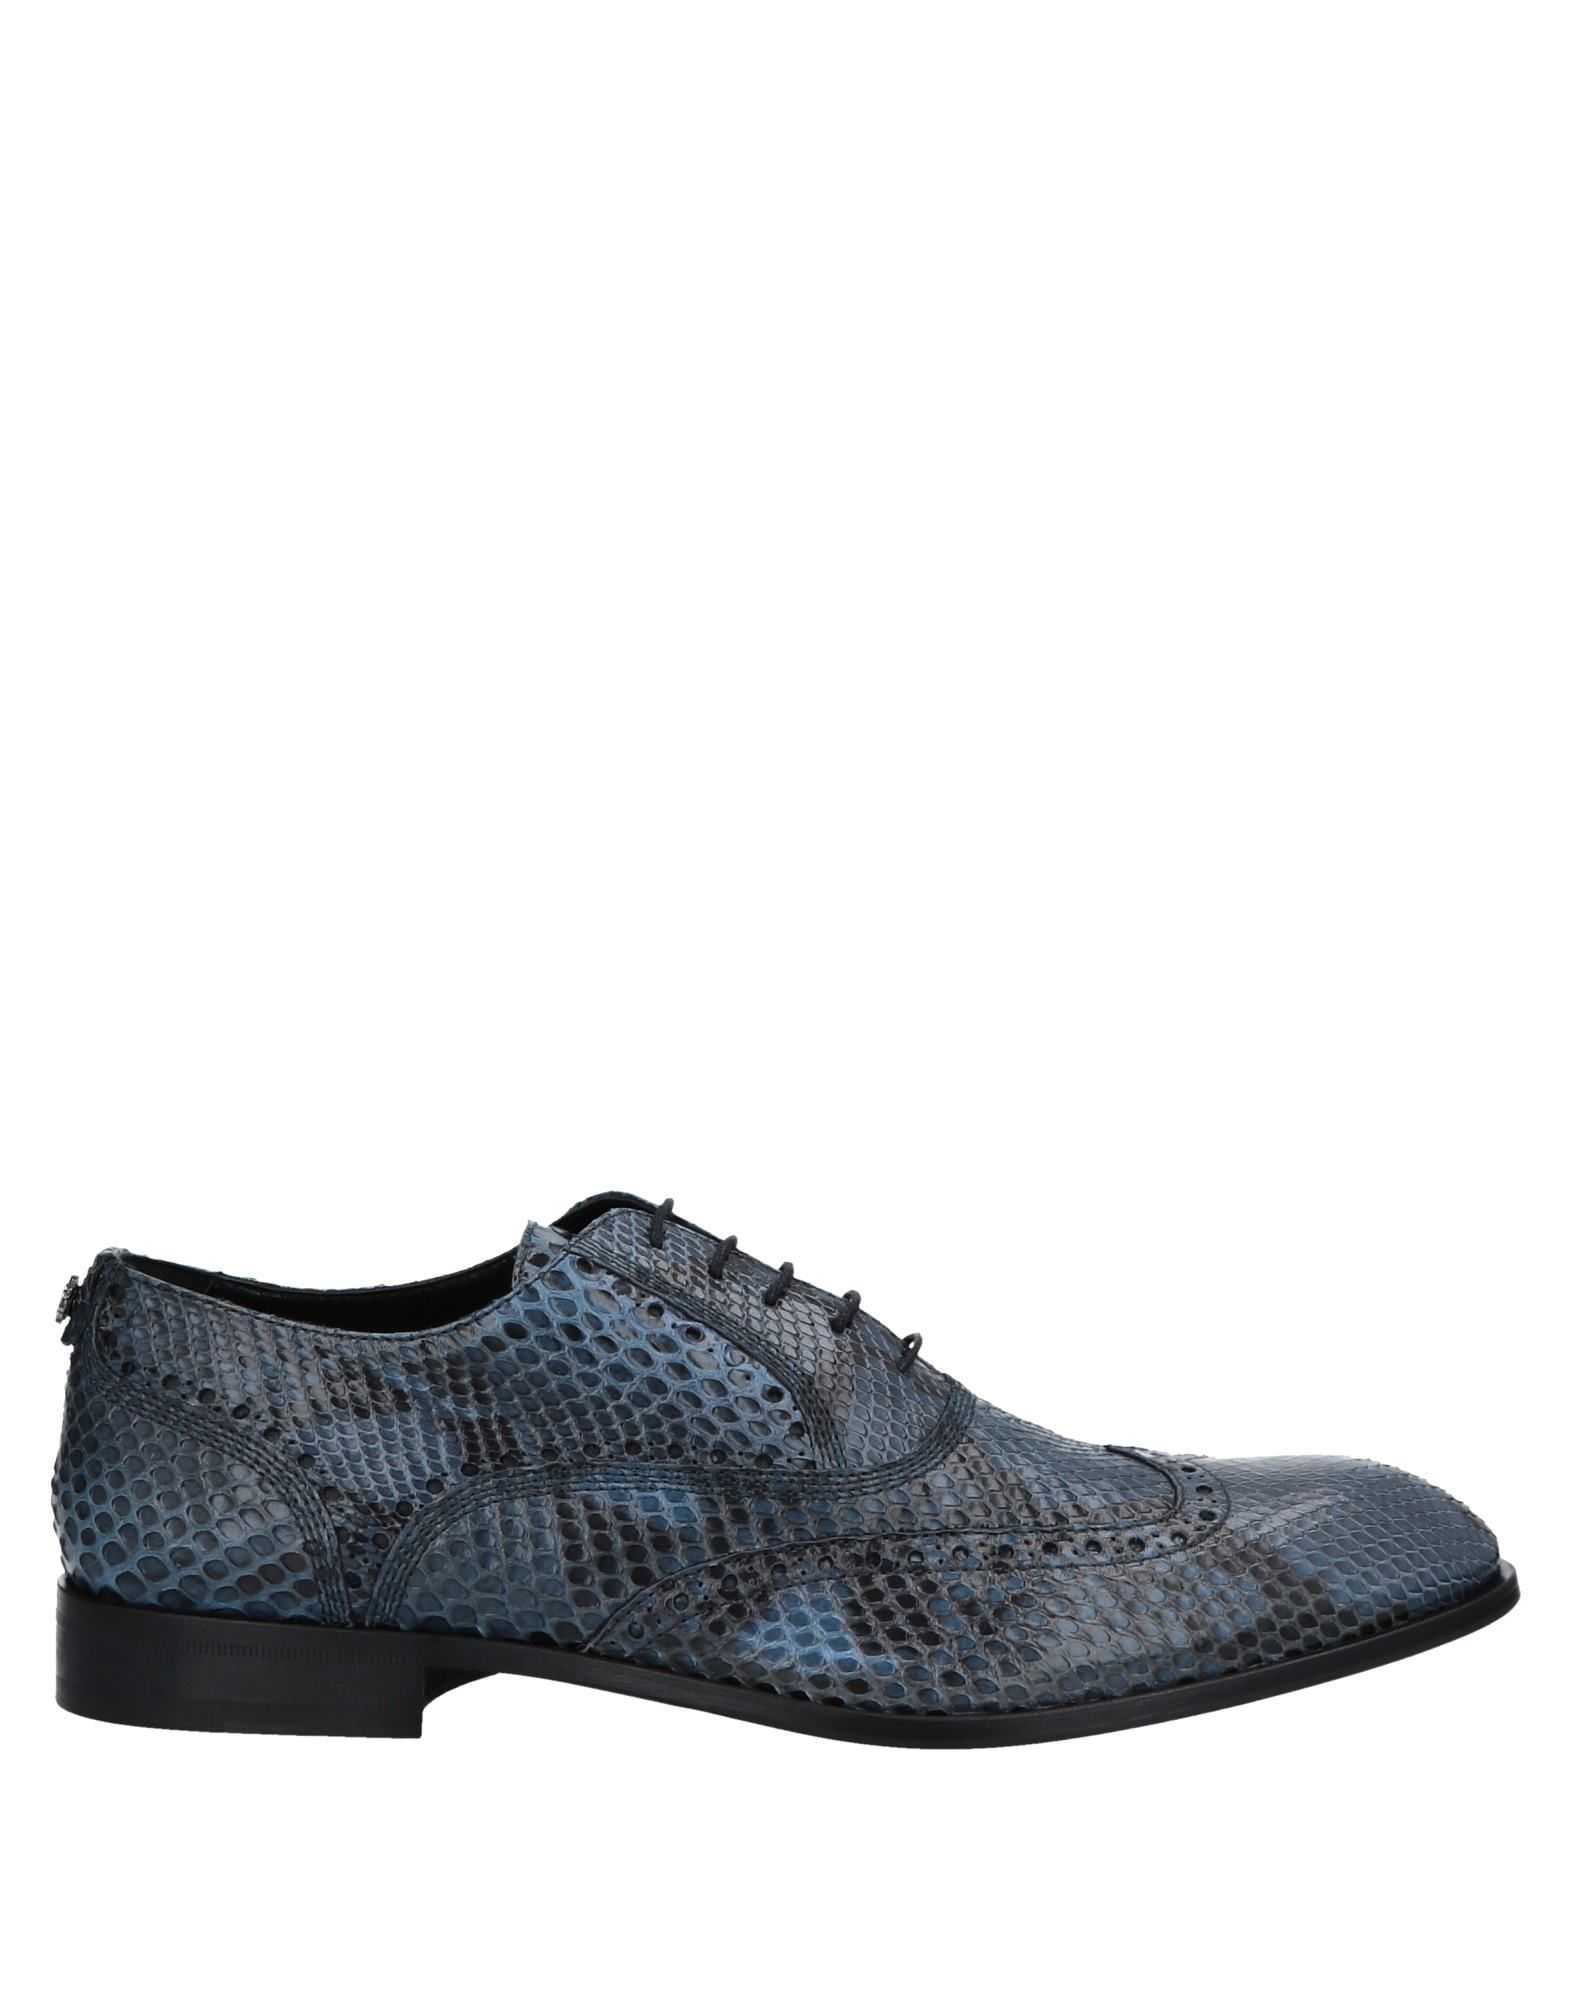 ROBERTO CAVALLI Обувь на шнурках